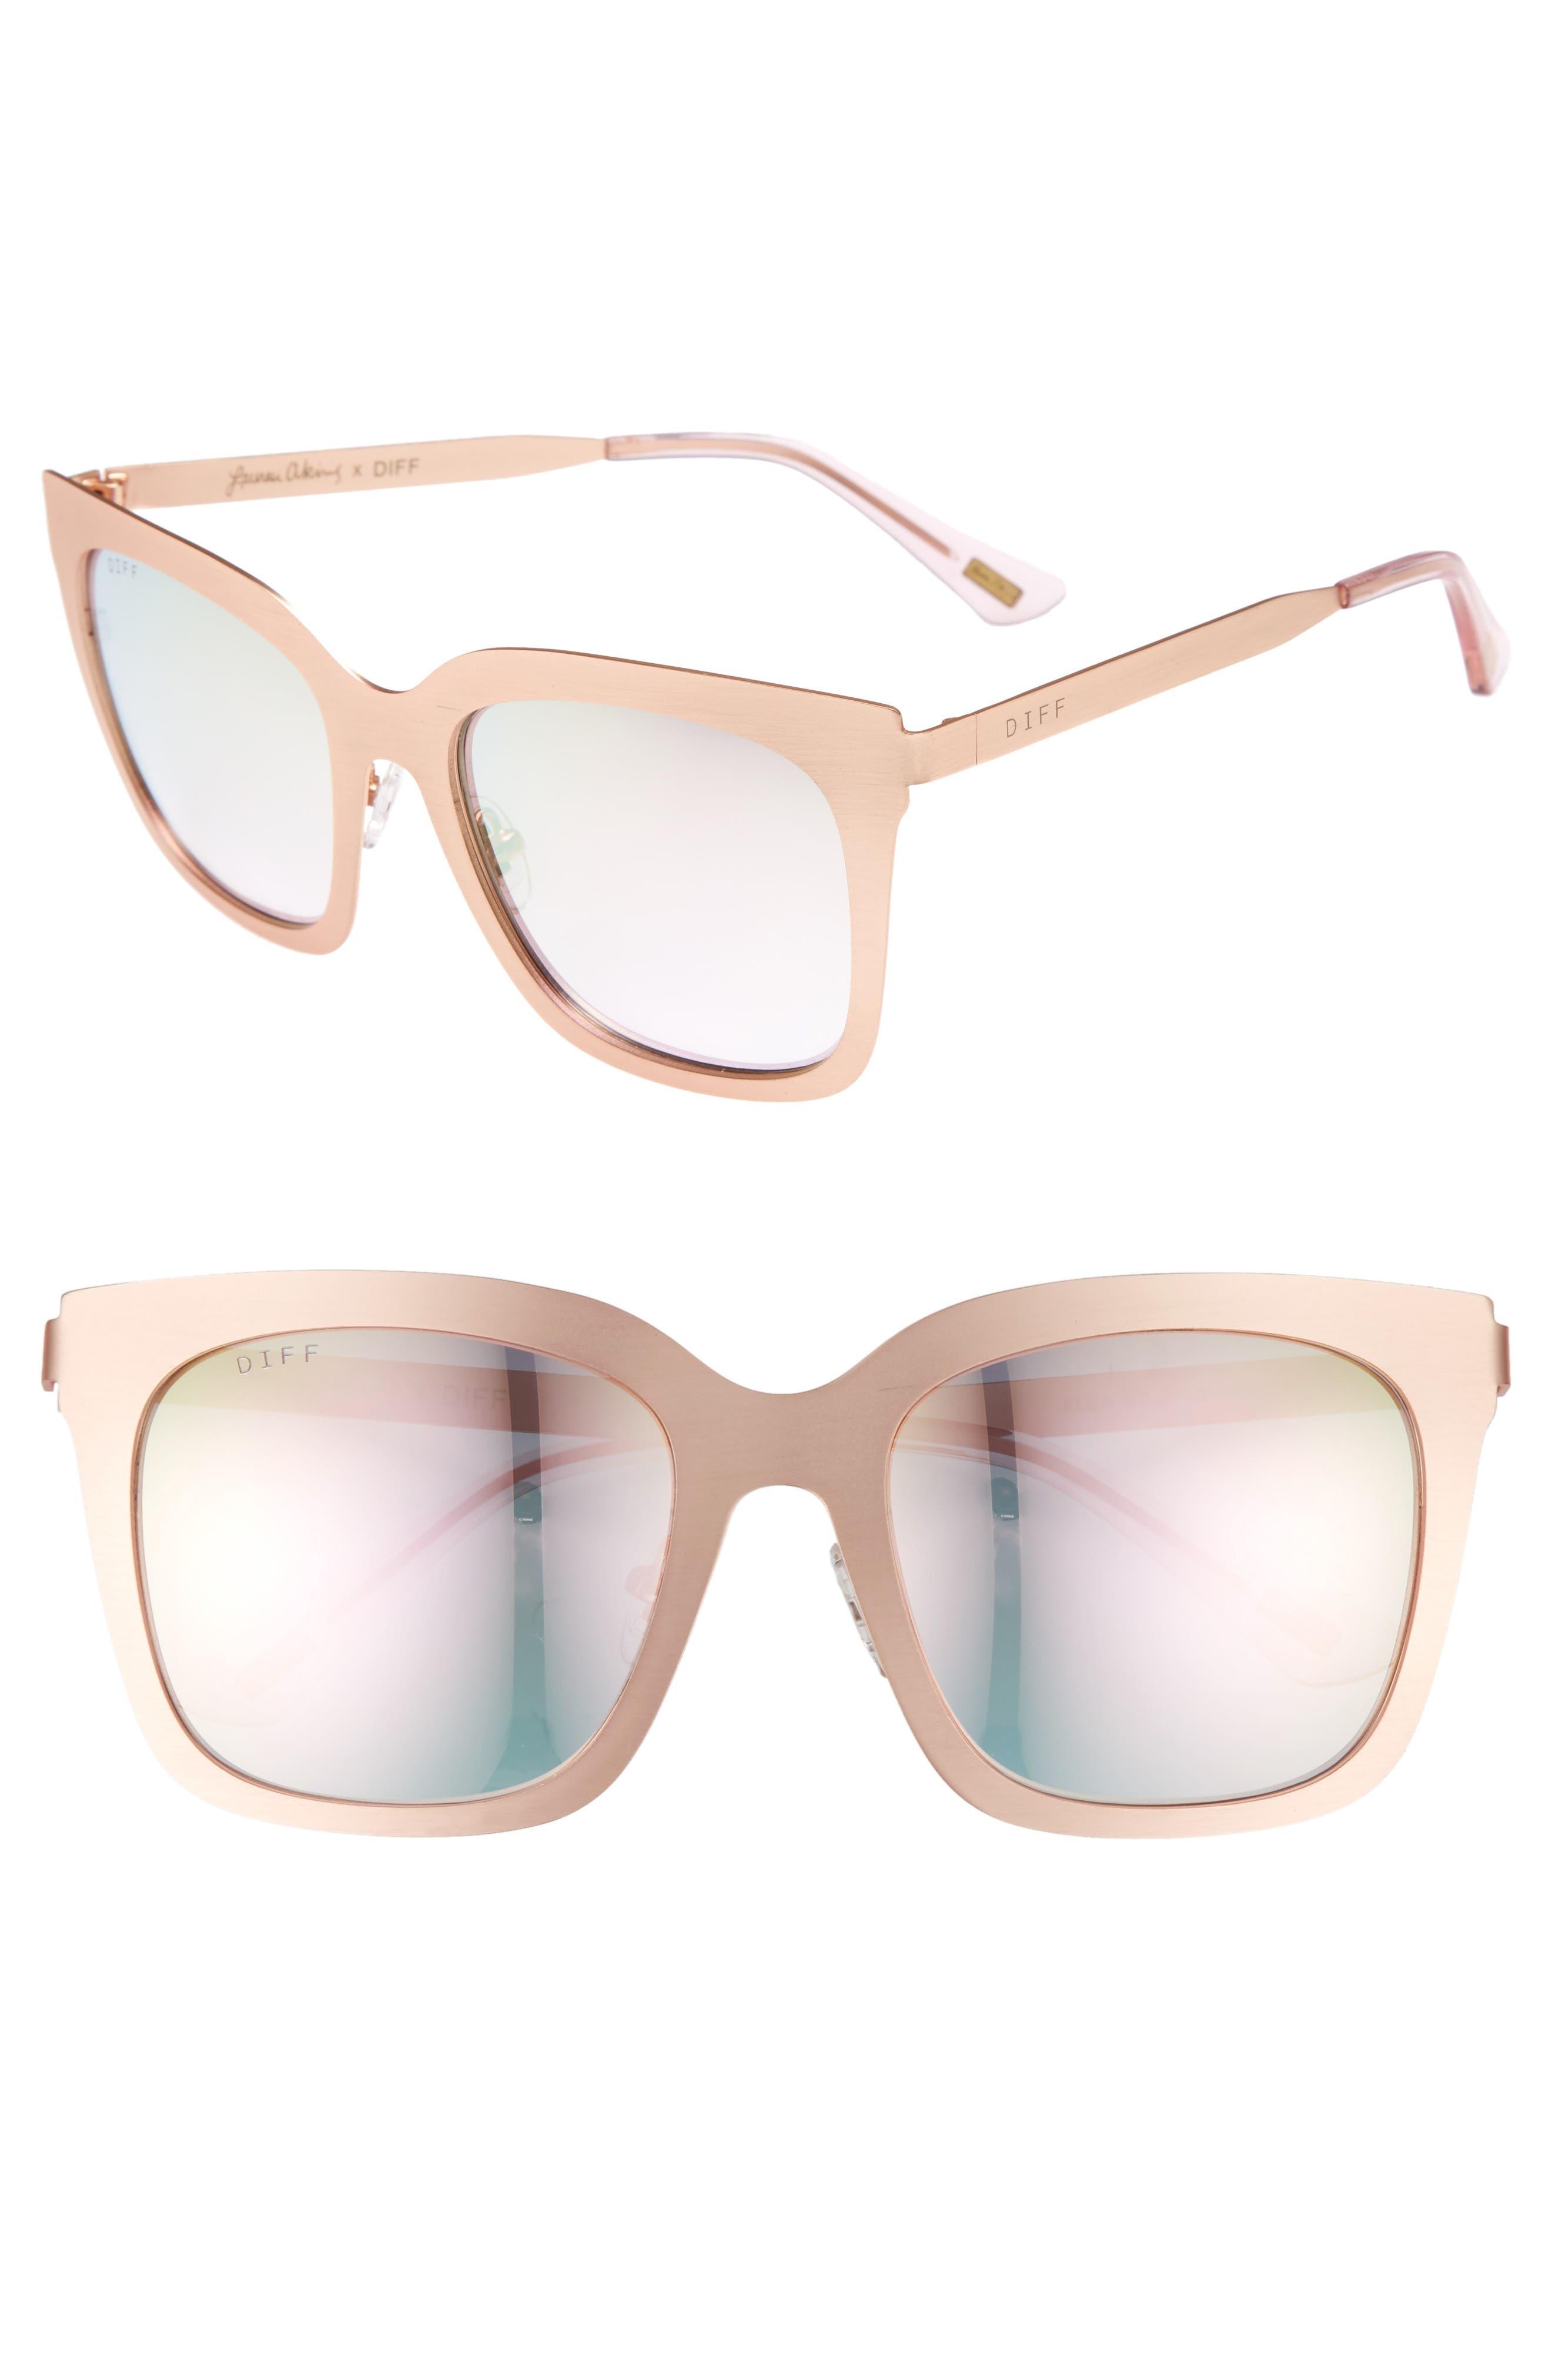 Main Image - DIFF x Lauren Akins Ella 53mm Sunglasses